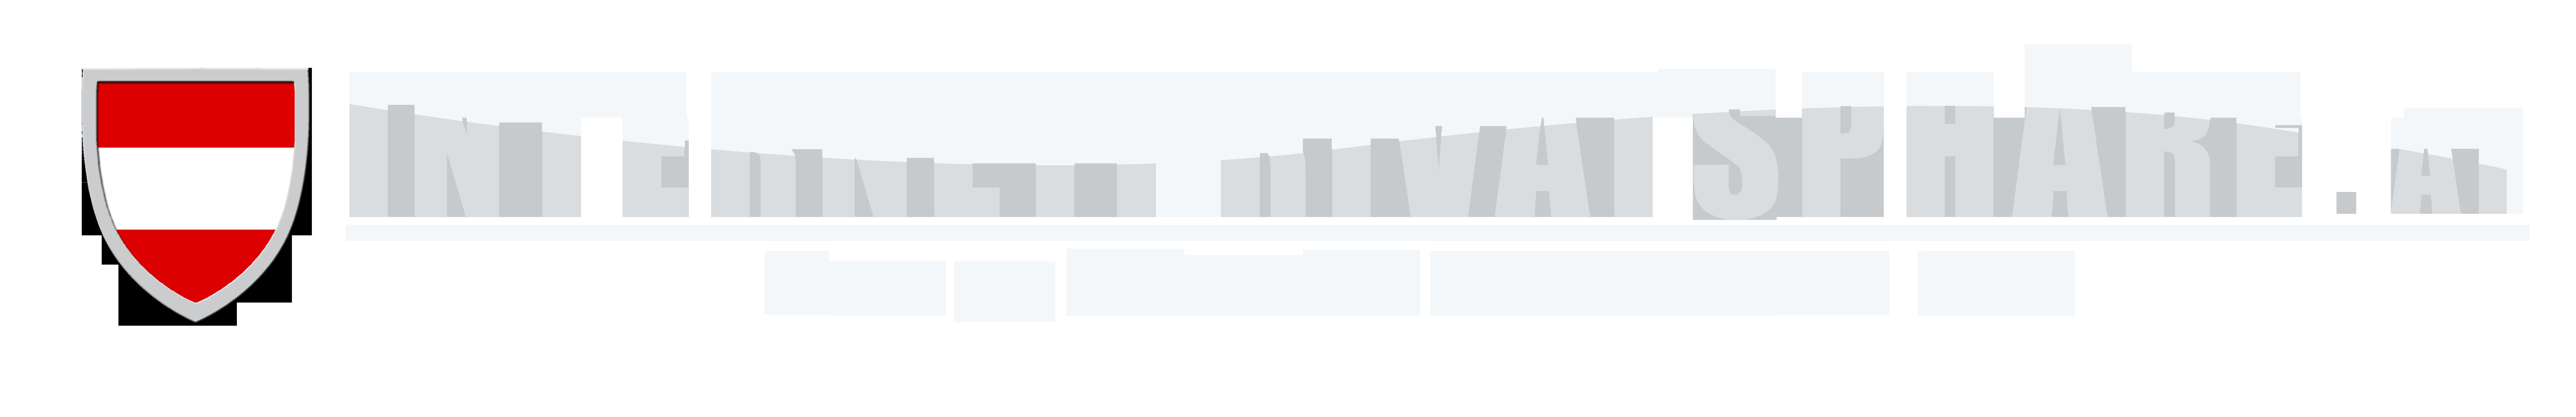 internet privatsphare